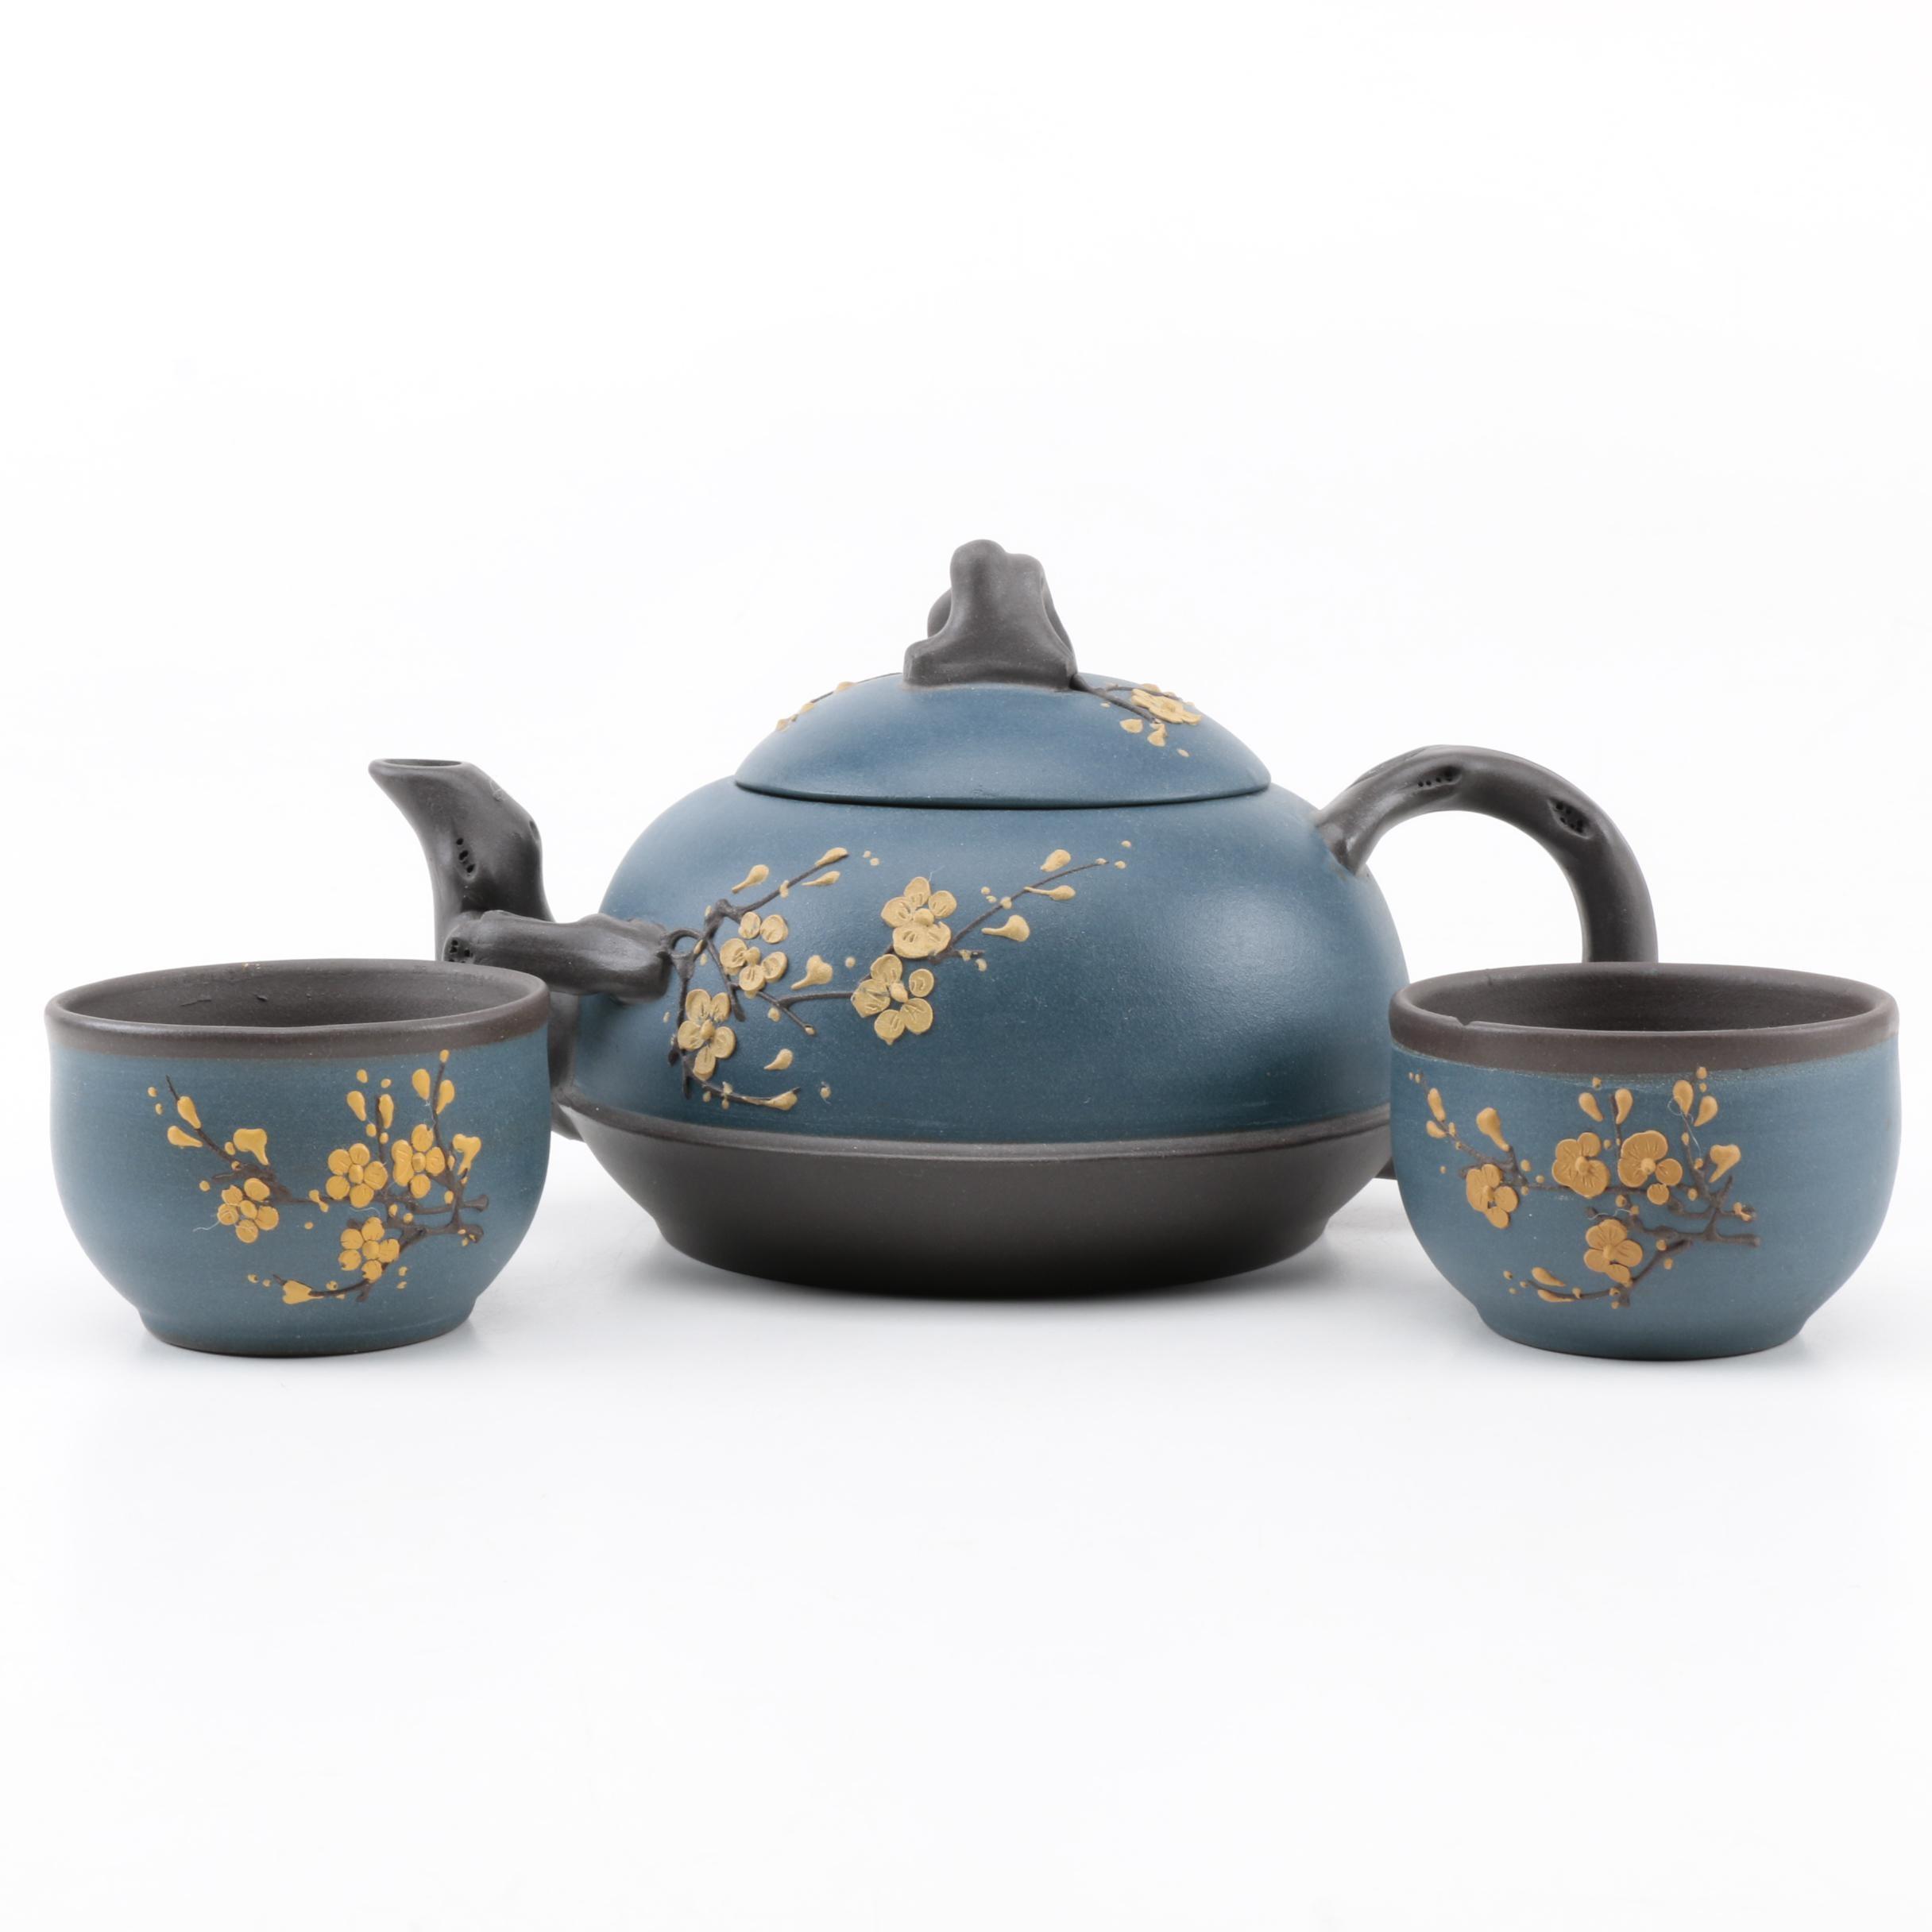 "Teavana ""Blue Cherry Blossom"" Tea Set"